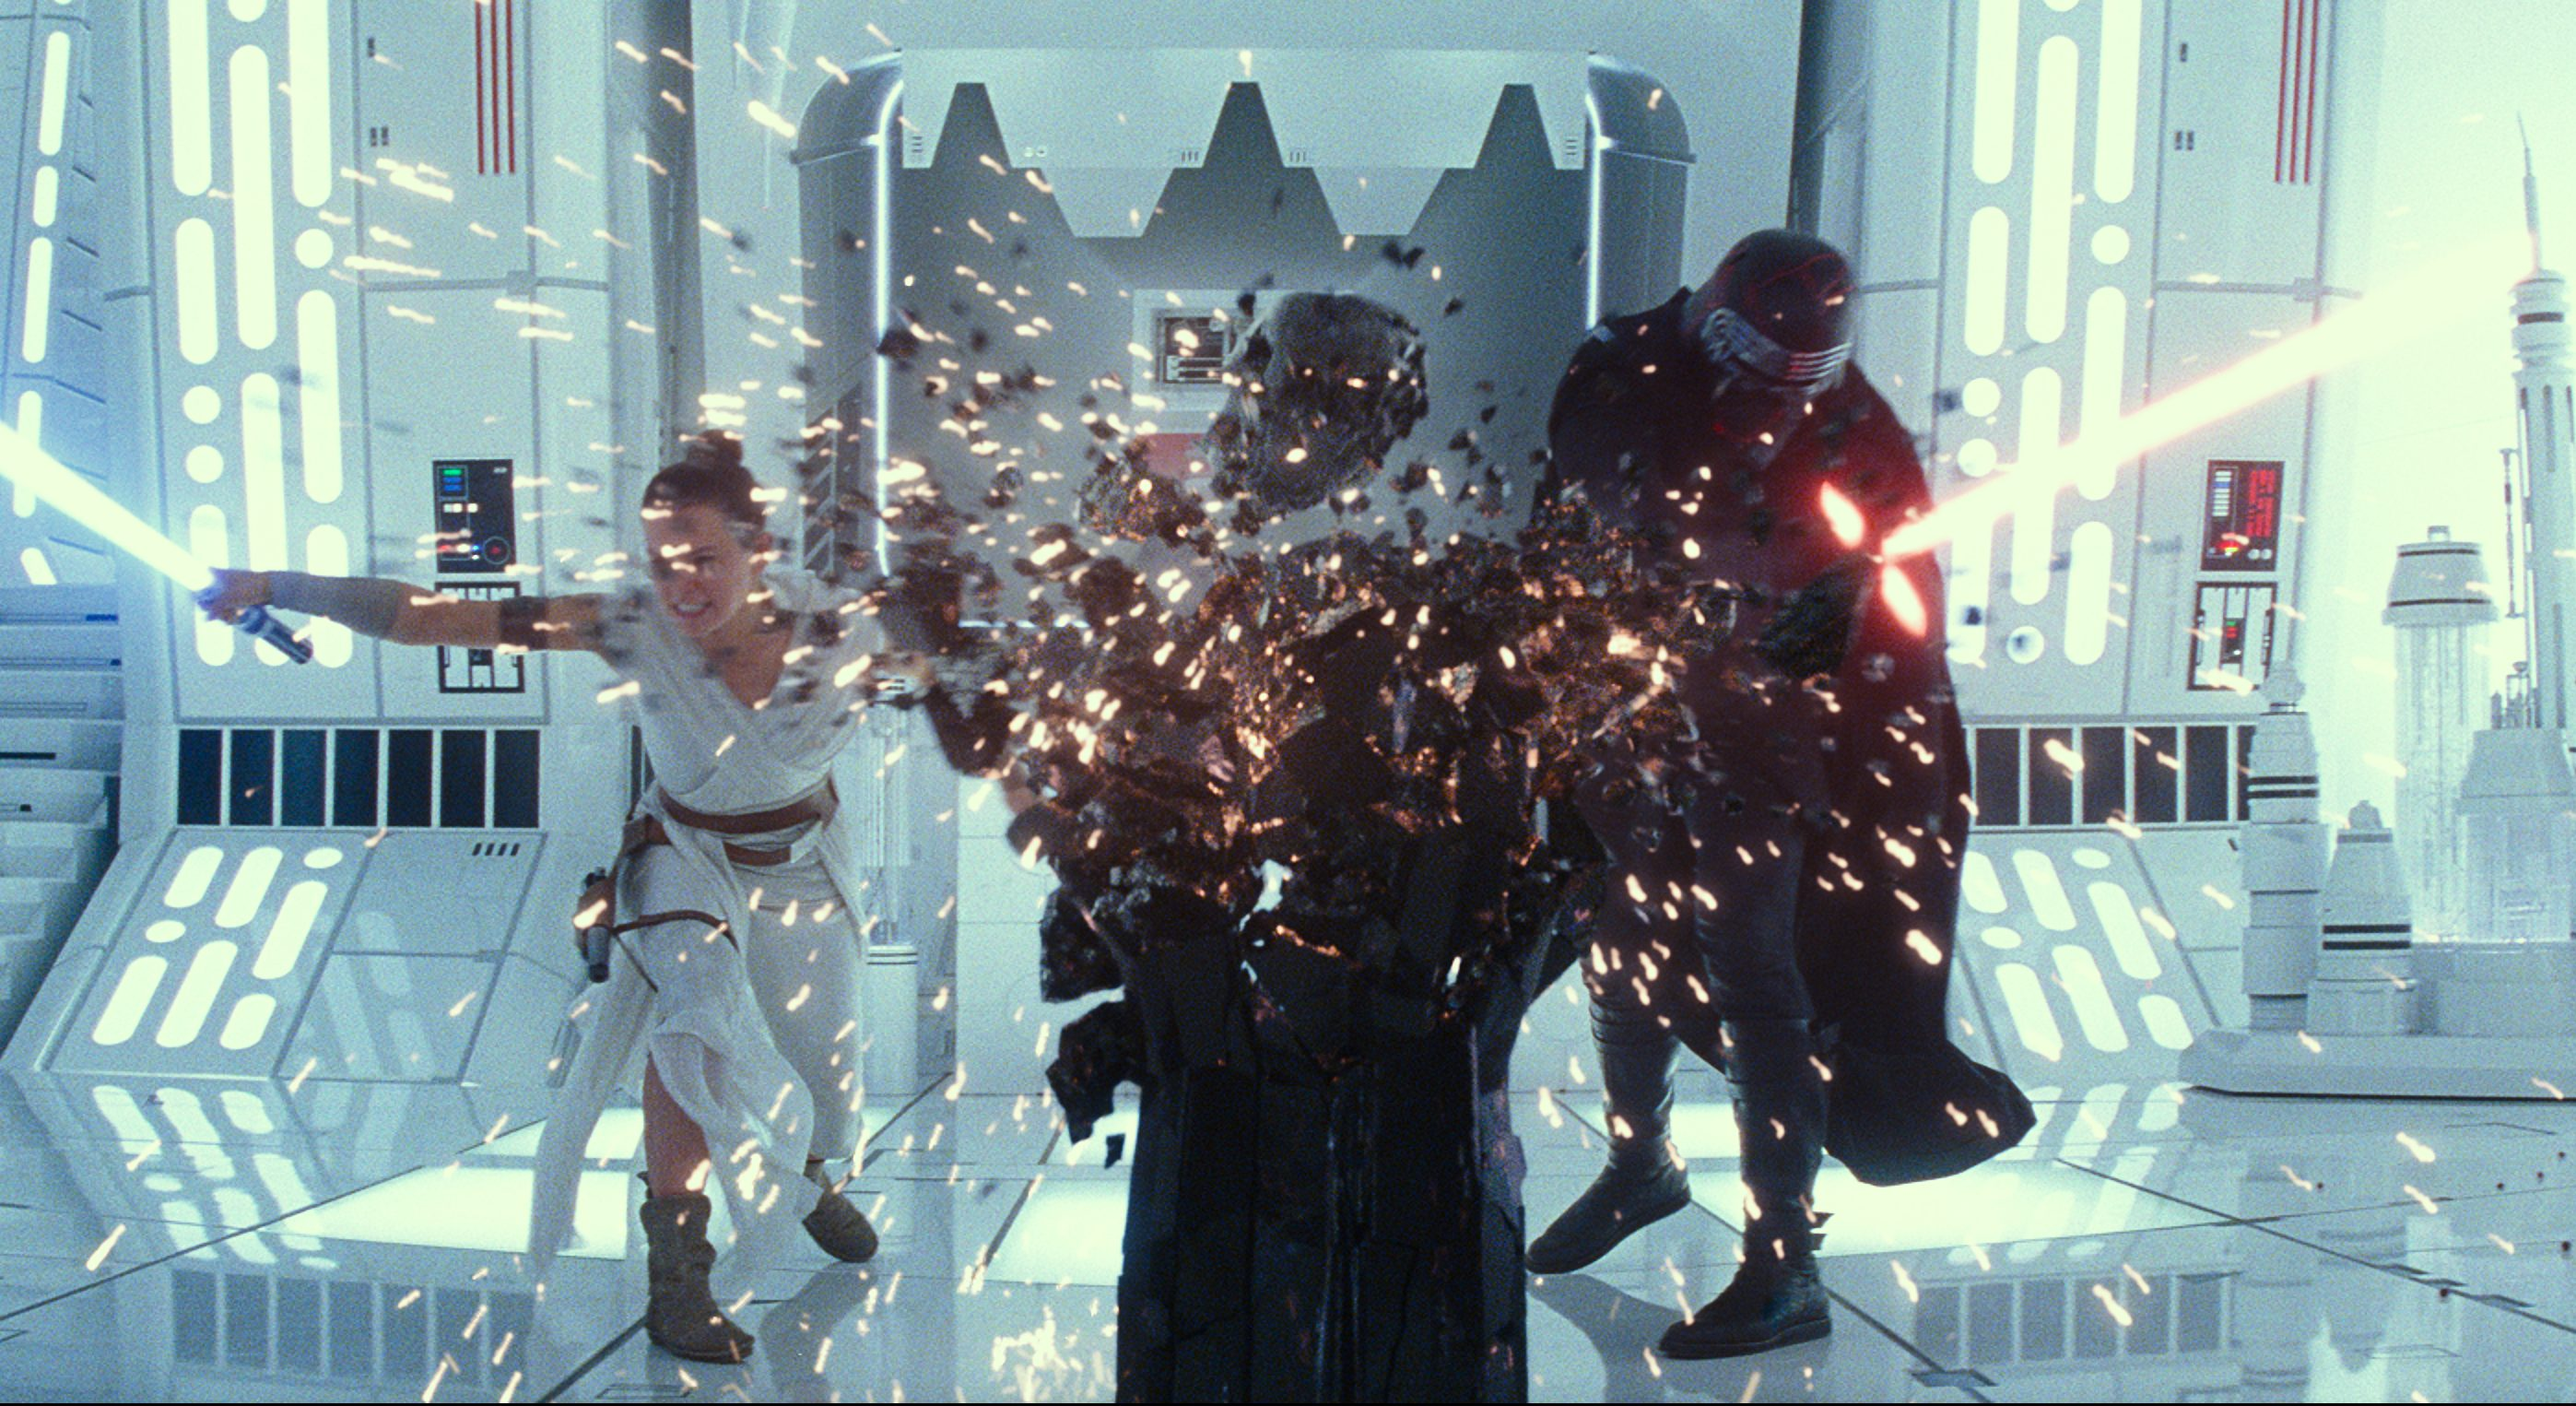 'Star Wars: Rise Of Skywalker' Lowers Lightsaber To $177M+, Still 3rd Best December Opening – Monday AM Update